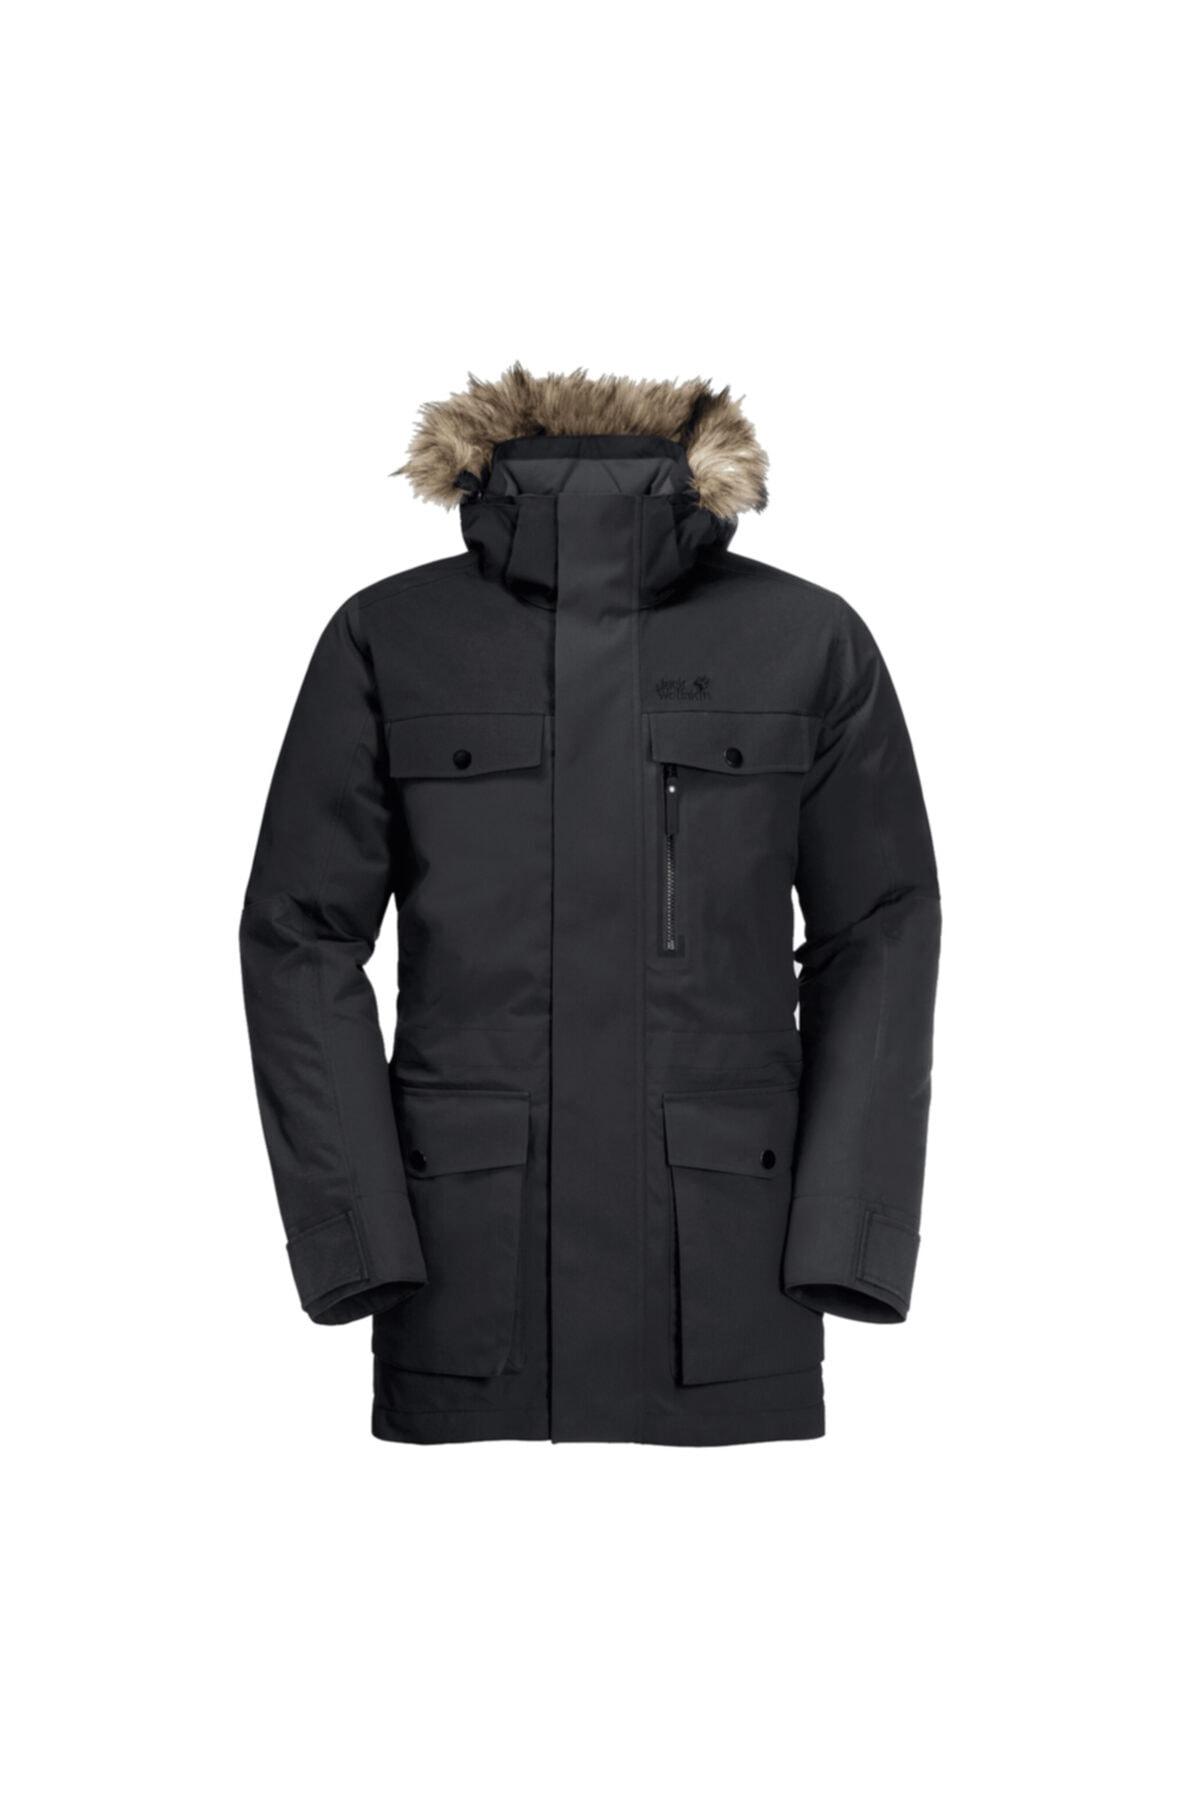 Erkek Siyah Glacier Bay Outdoor Parka 1113321-6000